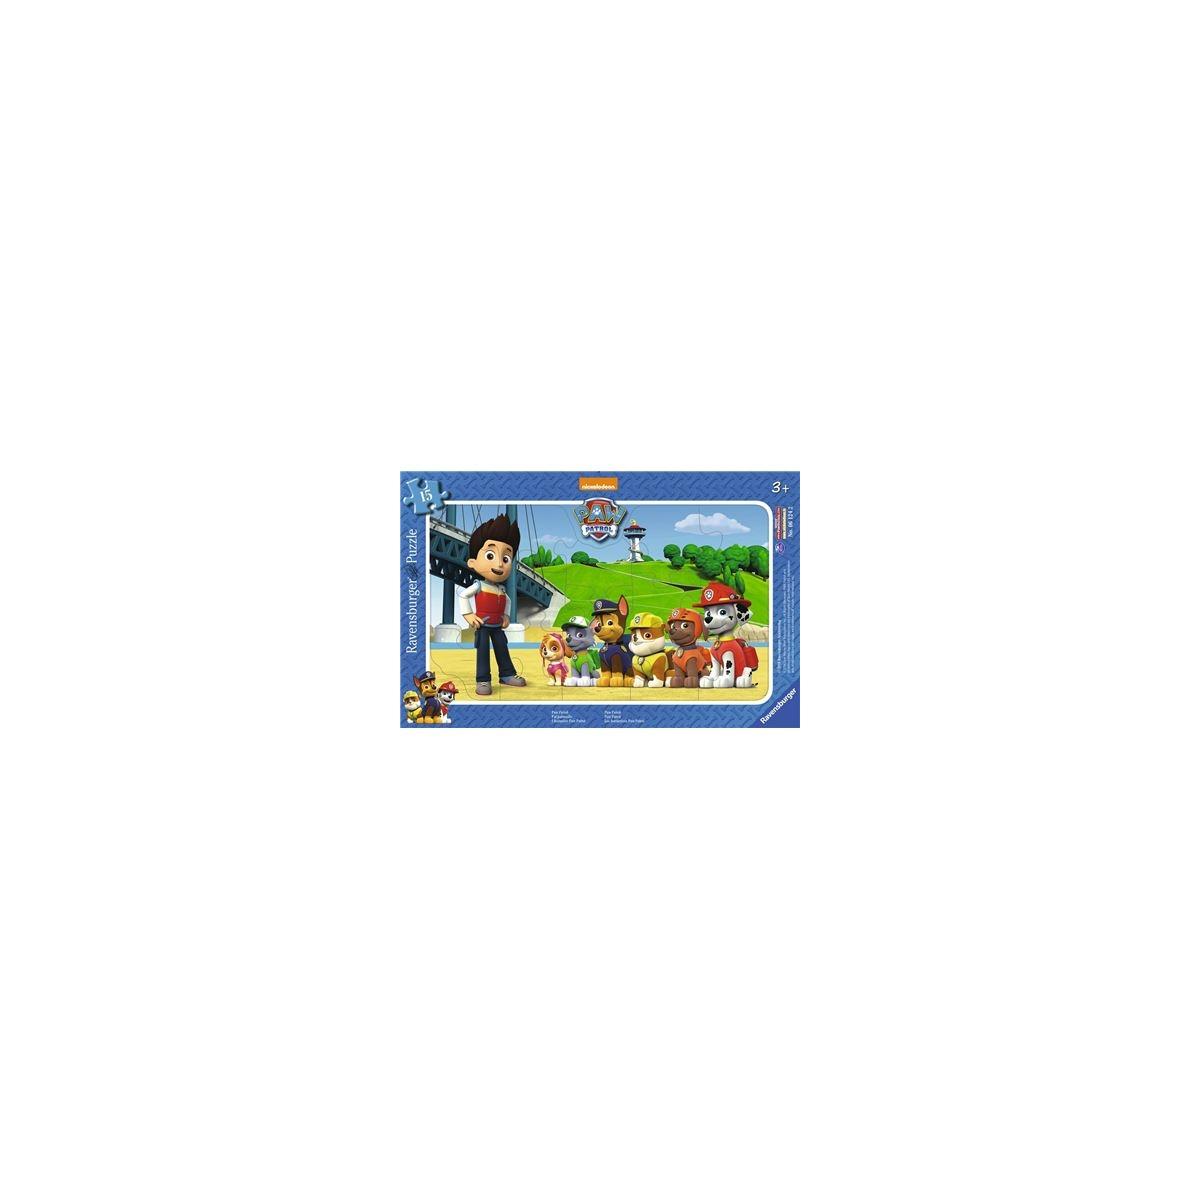 Ravensburger Puzzle - Rahmenpuzzle - Paw Patrol, 15 Teile